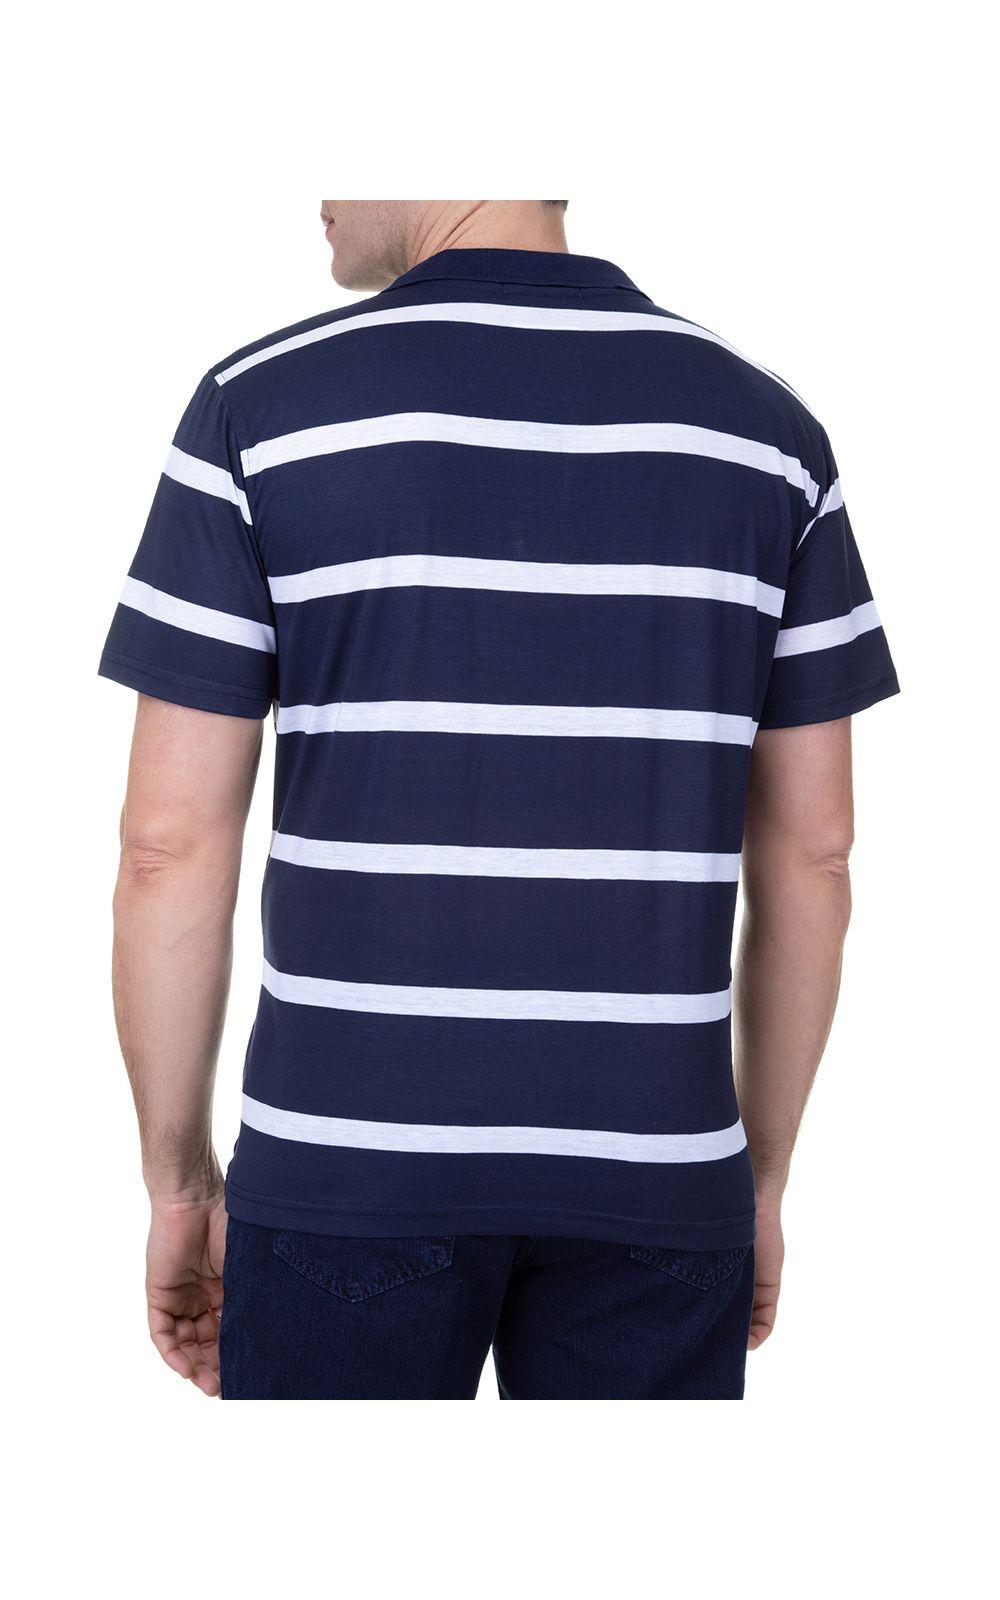 Foto 2 - Camisa Polo Masculina Azul Marinho Listrada